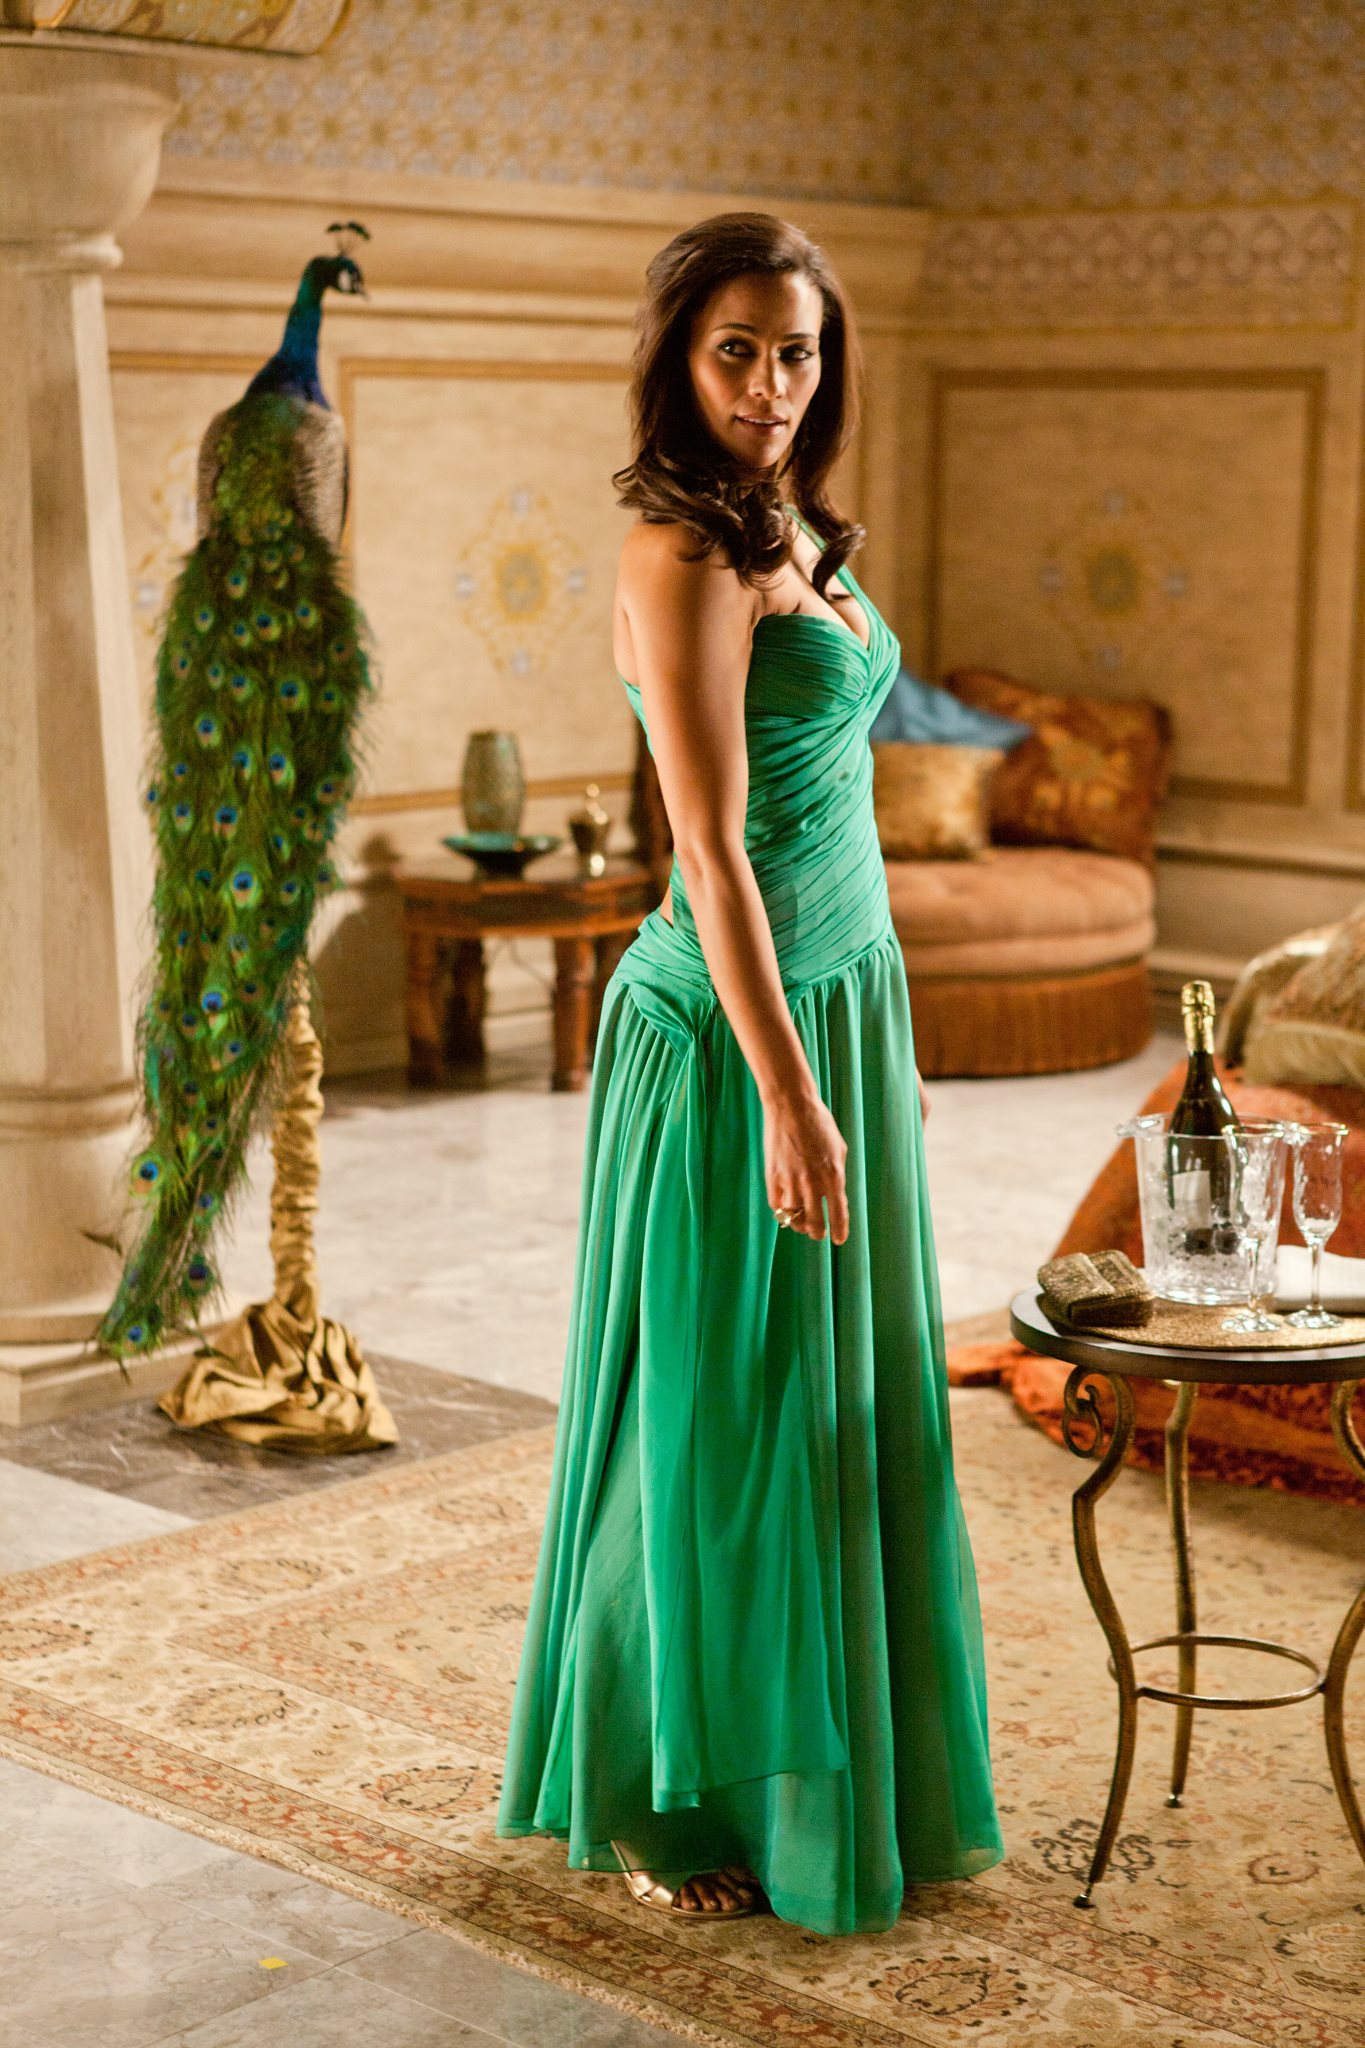 Paula Patton Green Evening Dress in Movie Mission ...